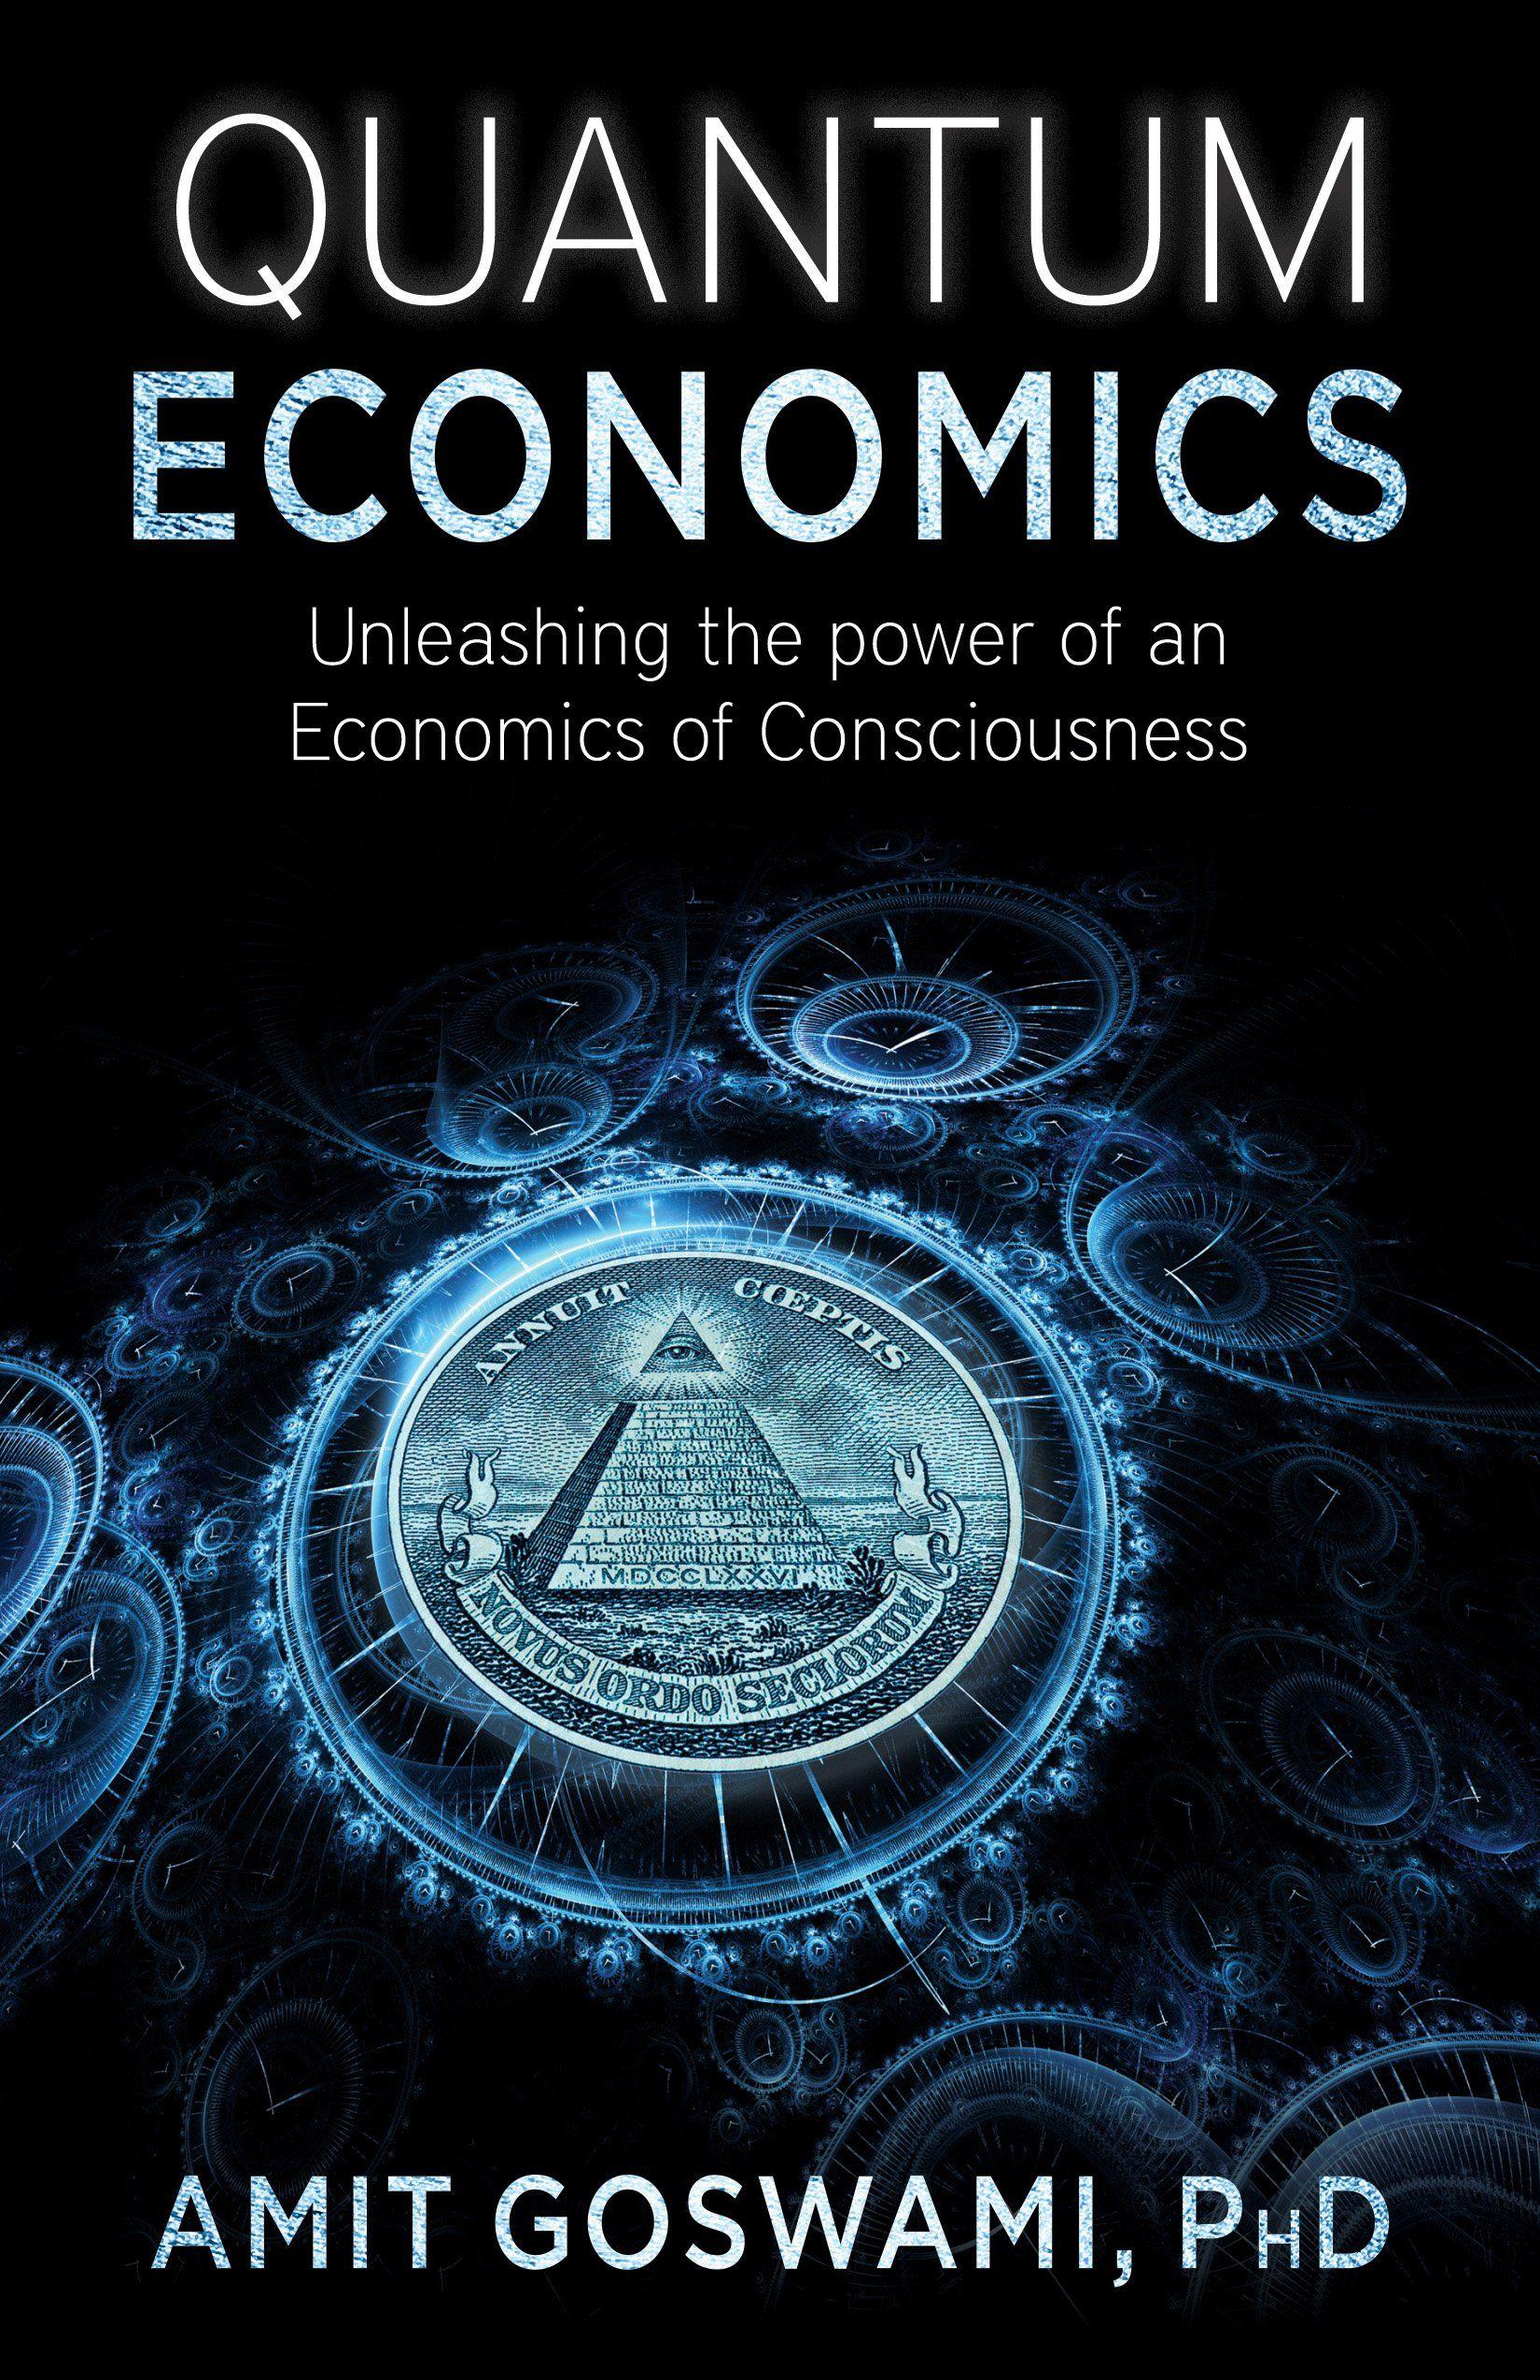 Pin by Nick Locascio on Capitalist books Quantum, Game